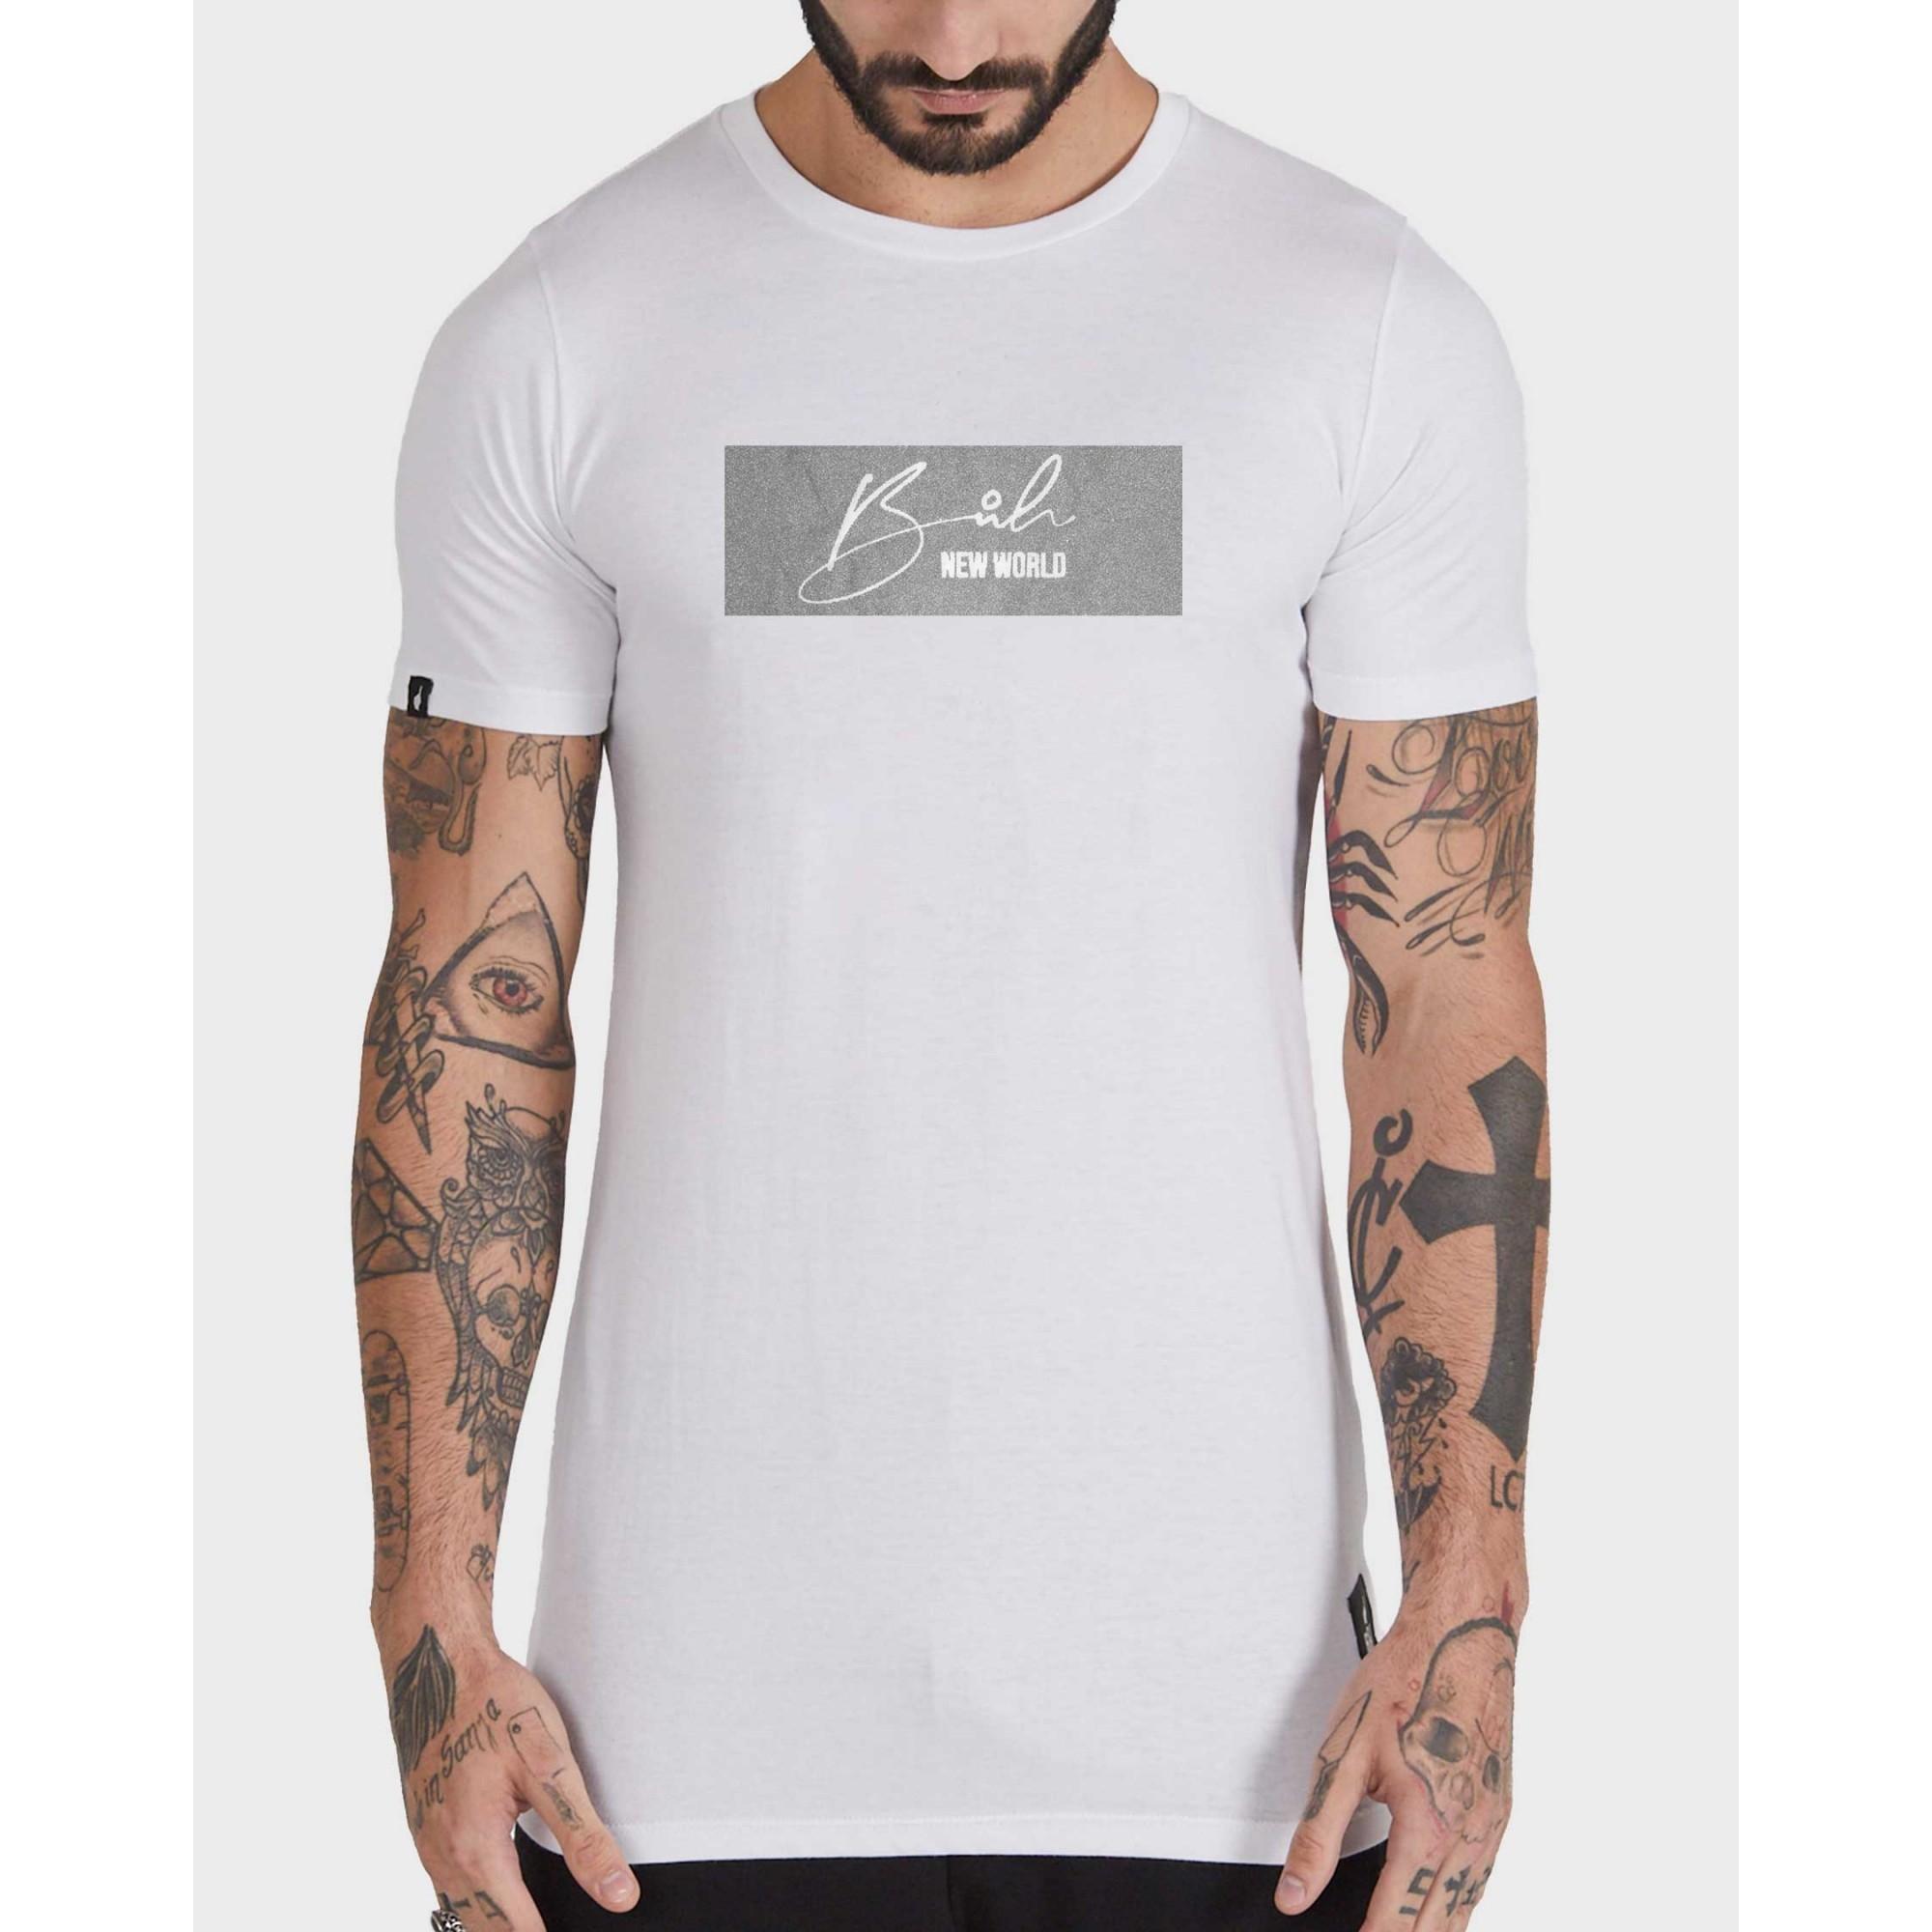 Camiseta Buh Glitter White & SIlver